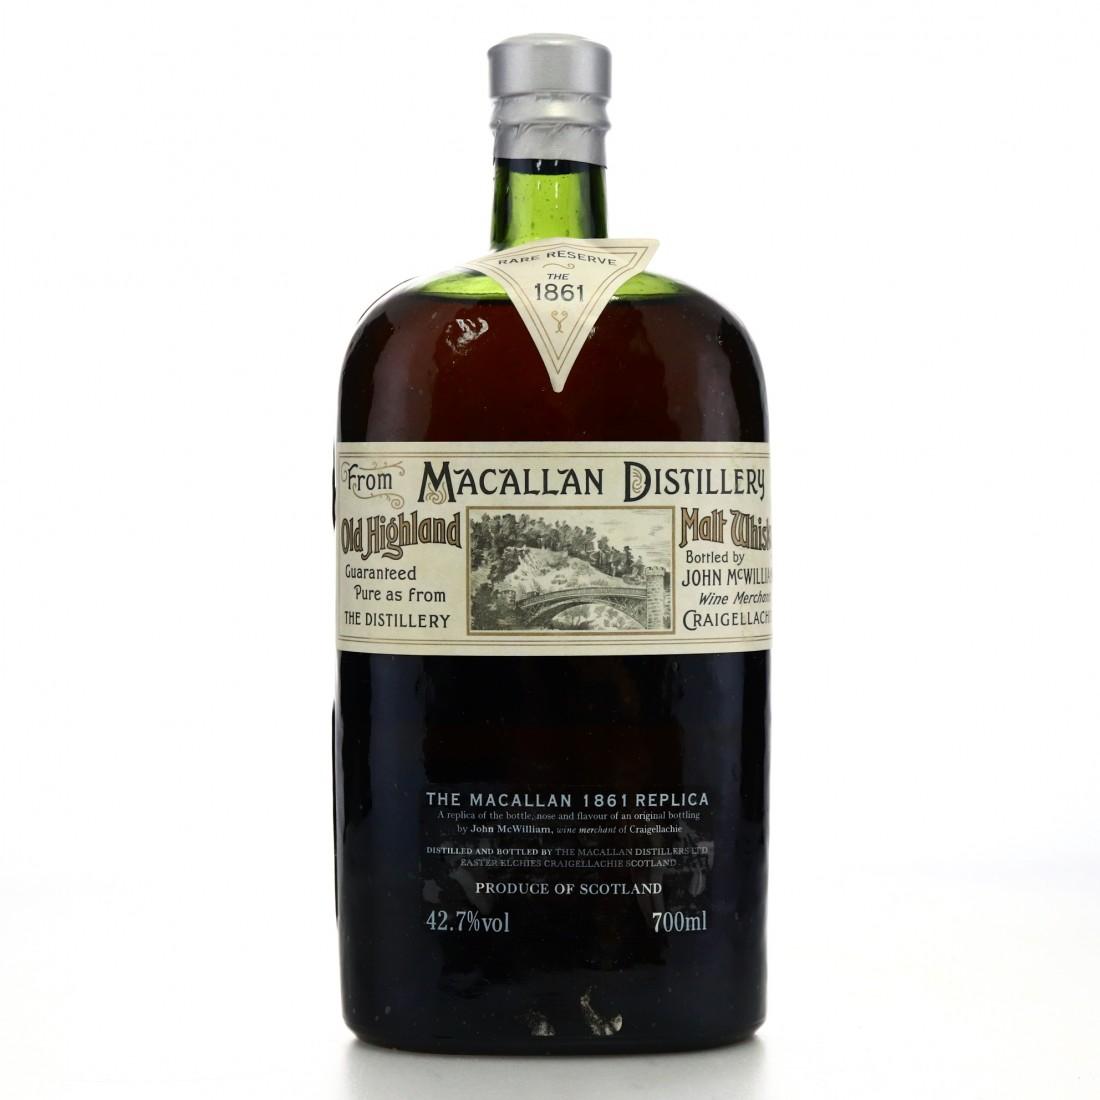 Macallan 1861 Replica